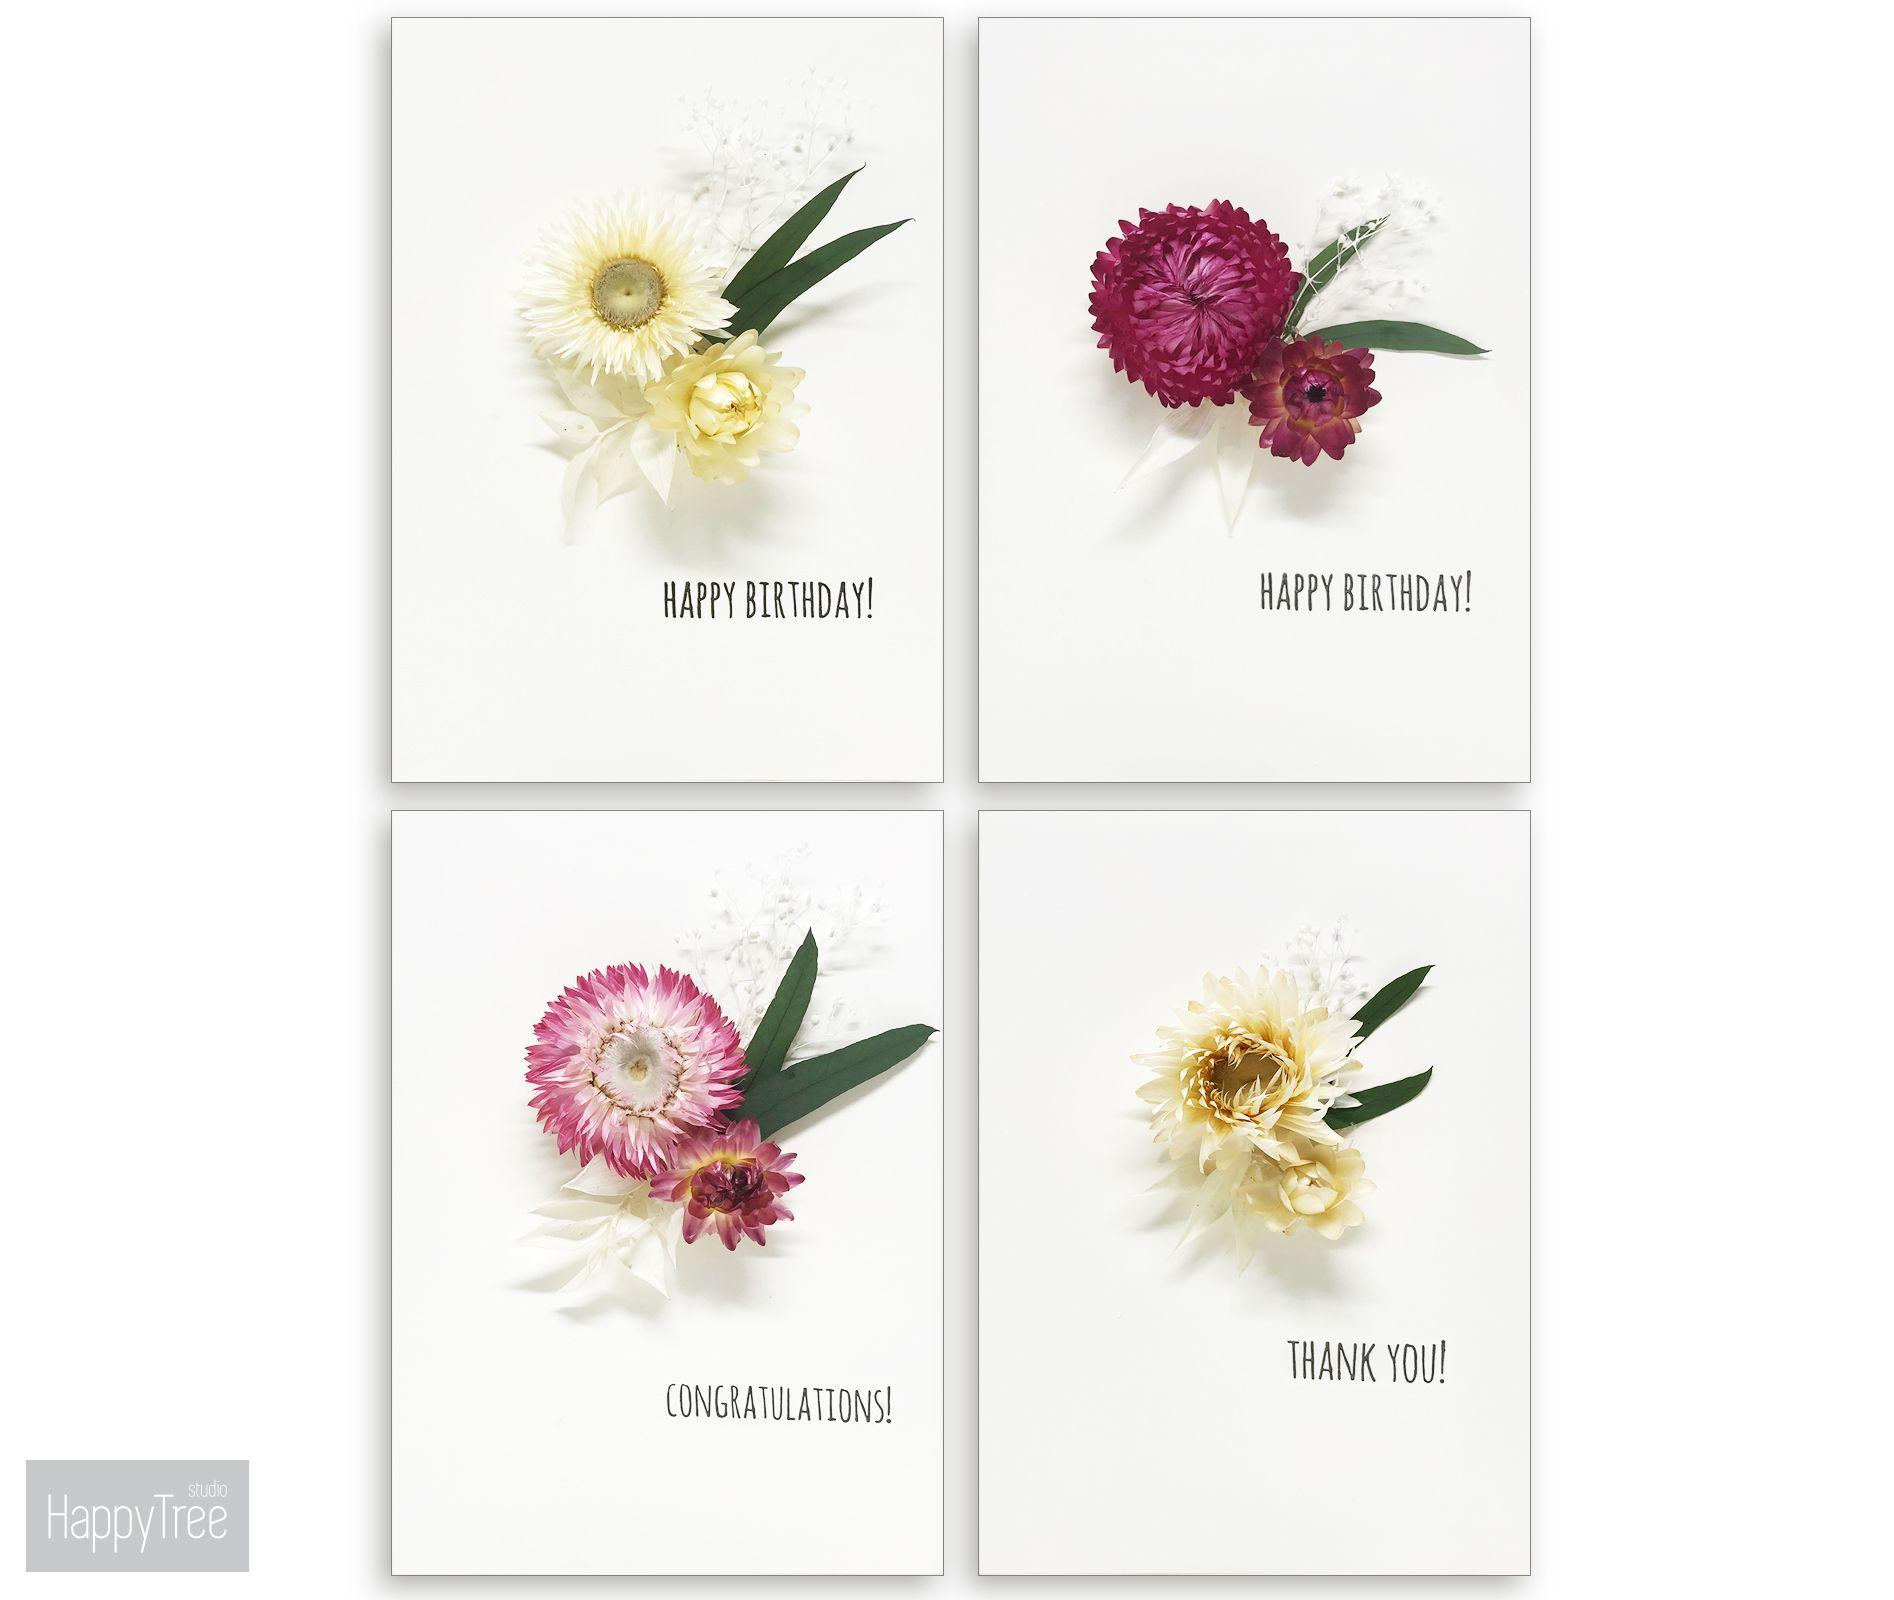 3d floral greeting cards custom stamp handmade cards birthday card flower izmirmasajfo Choice Image